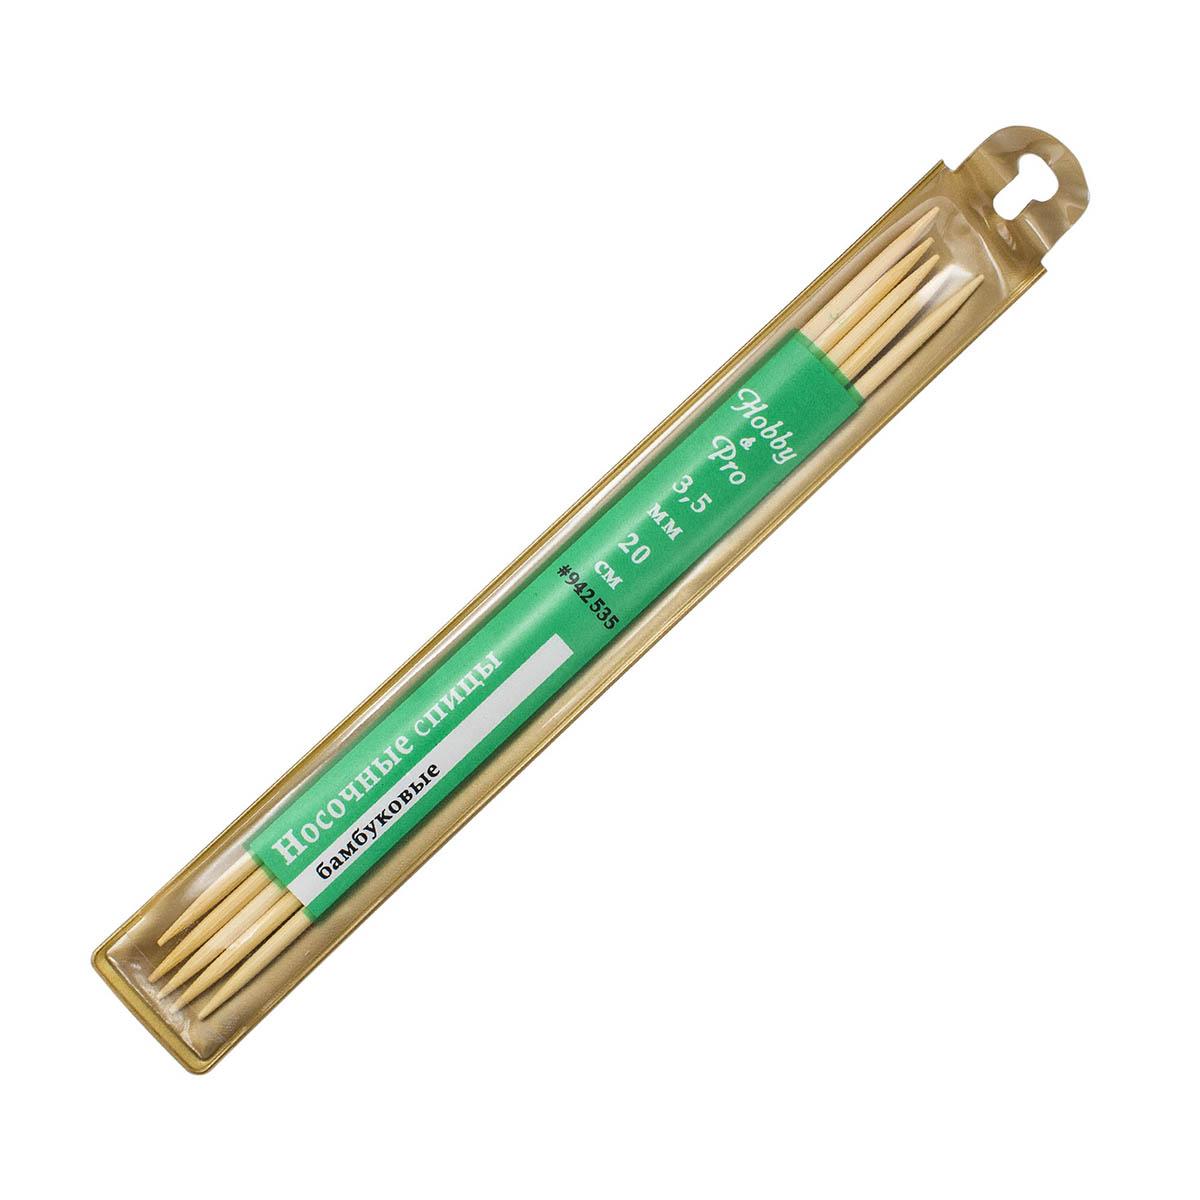 Спицы носочные бамбук 942535, 20 см, 3,5 мм, Hobby&Pro